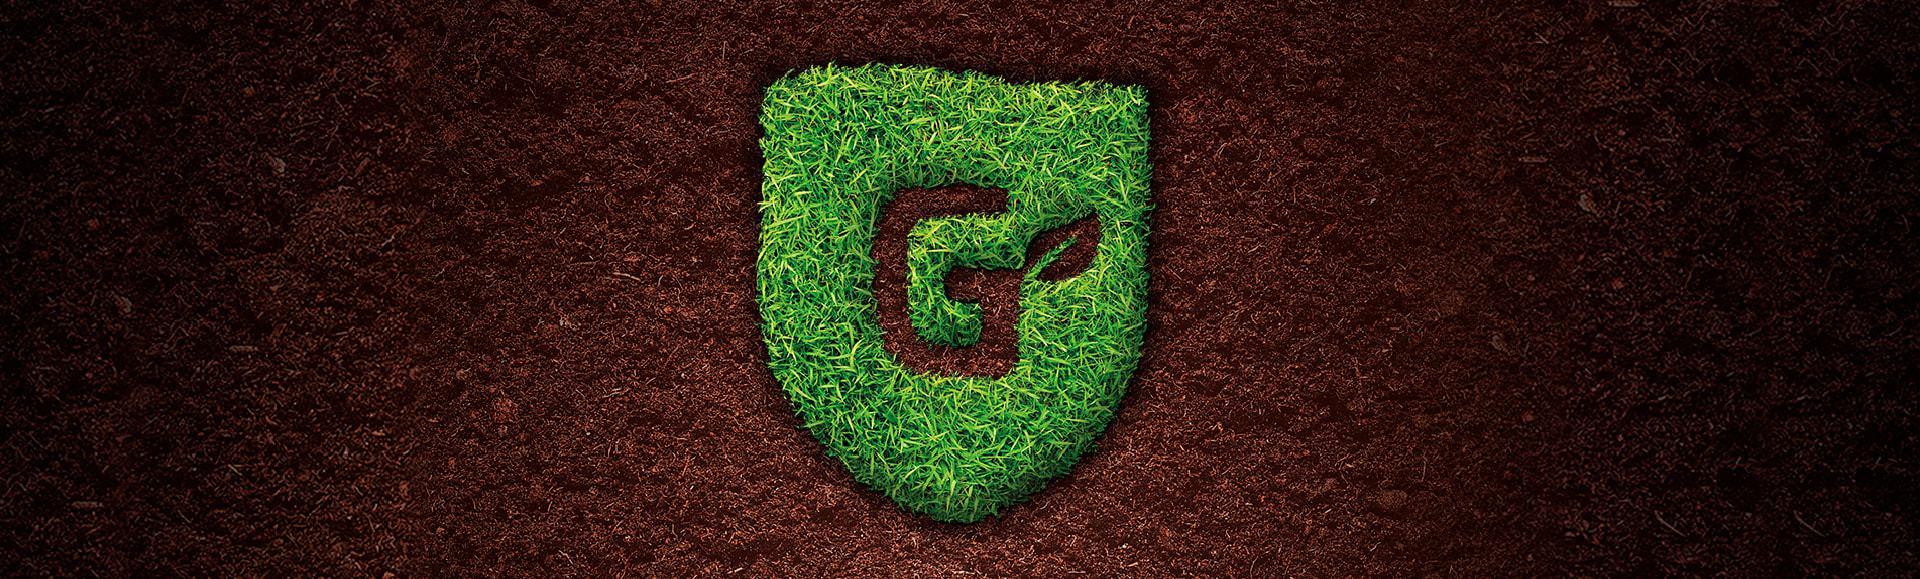 Branding e Identidad corporativa para marca Groway. Grupo Miralbueno